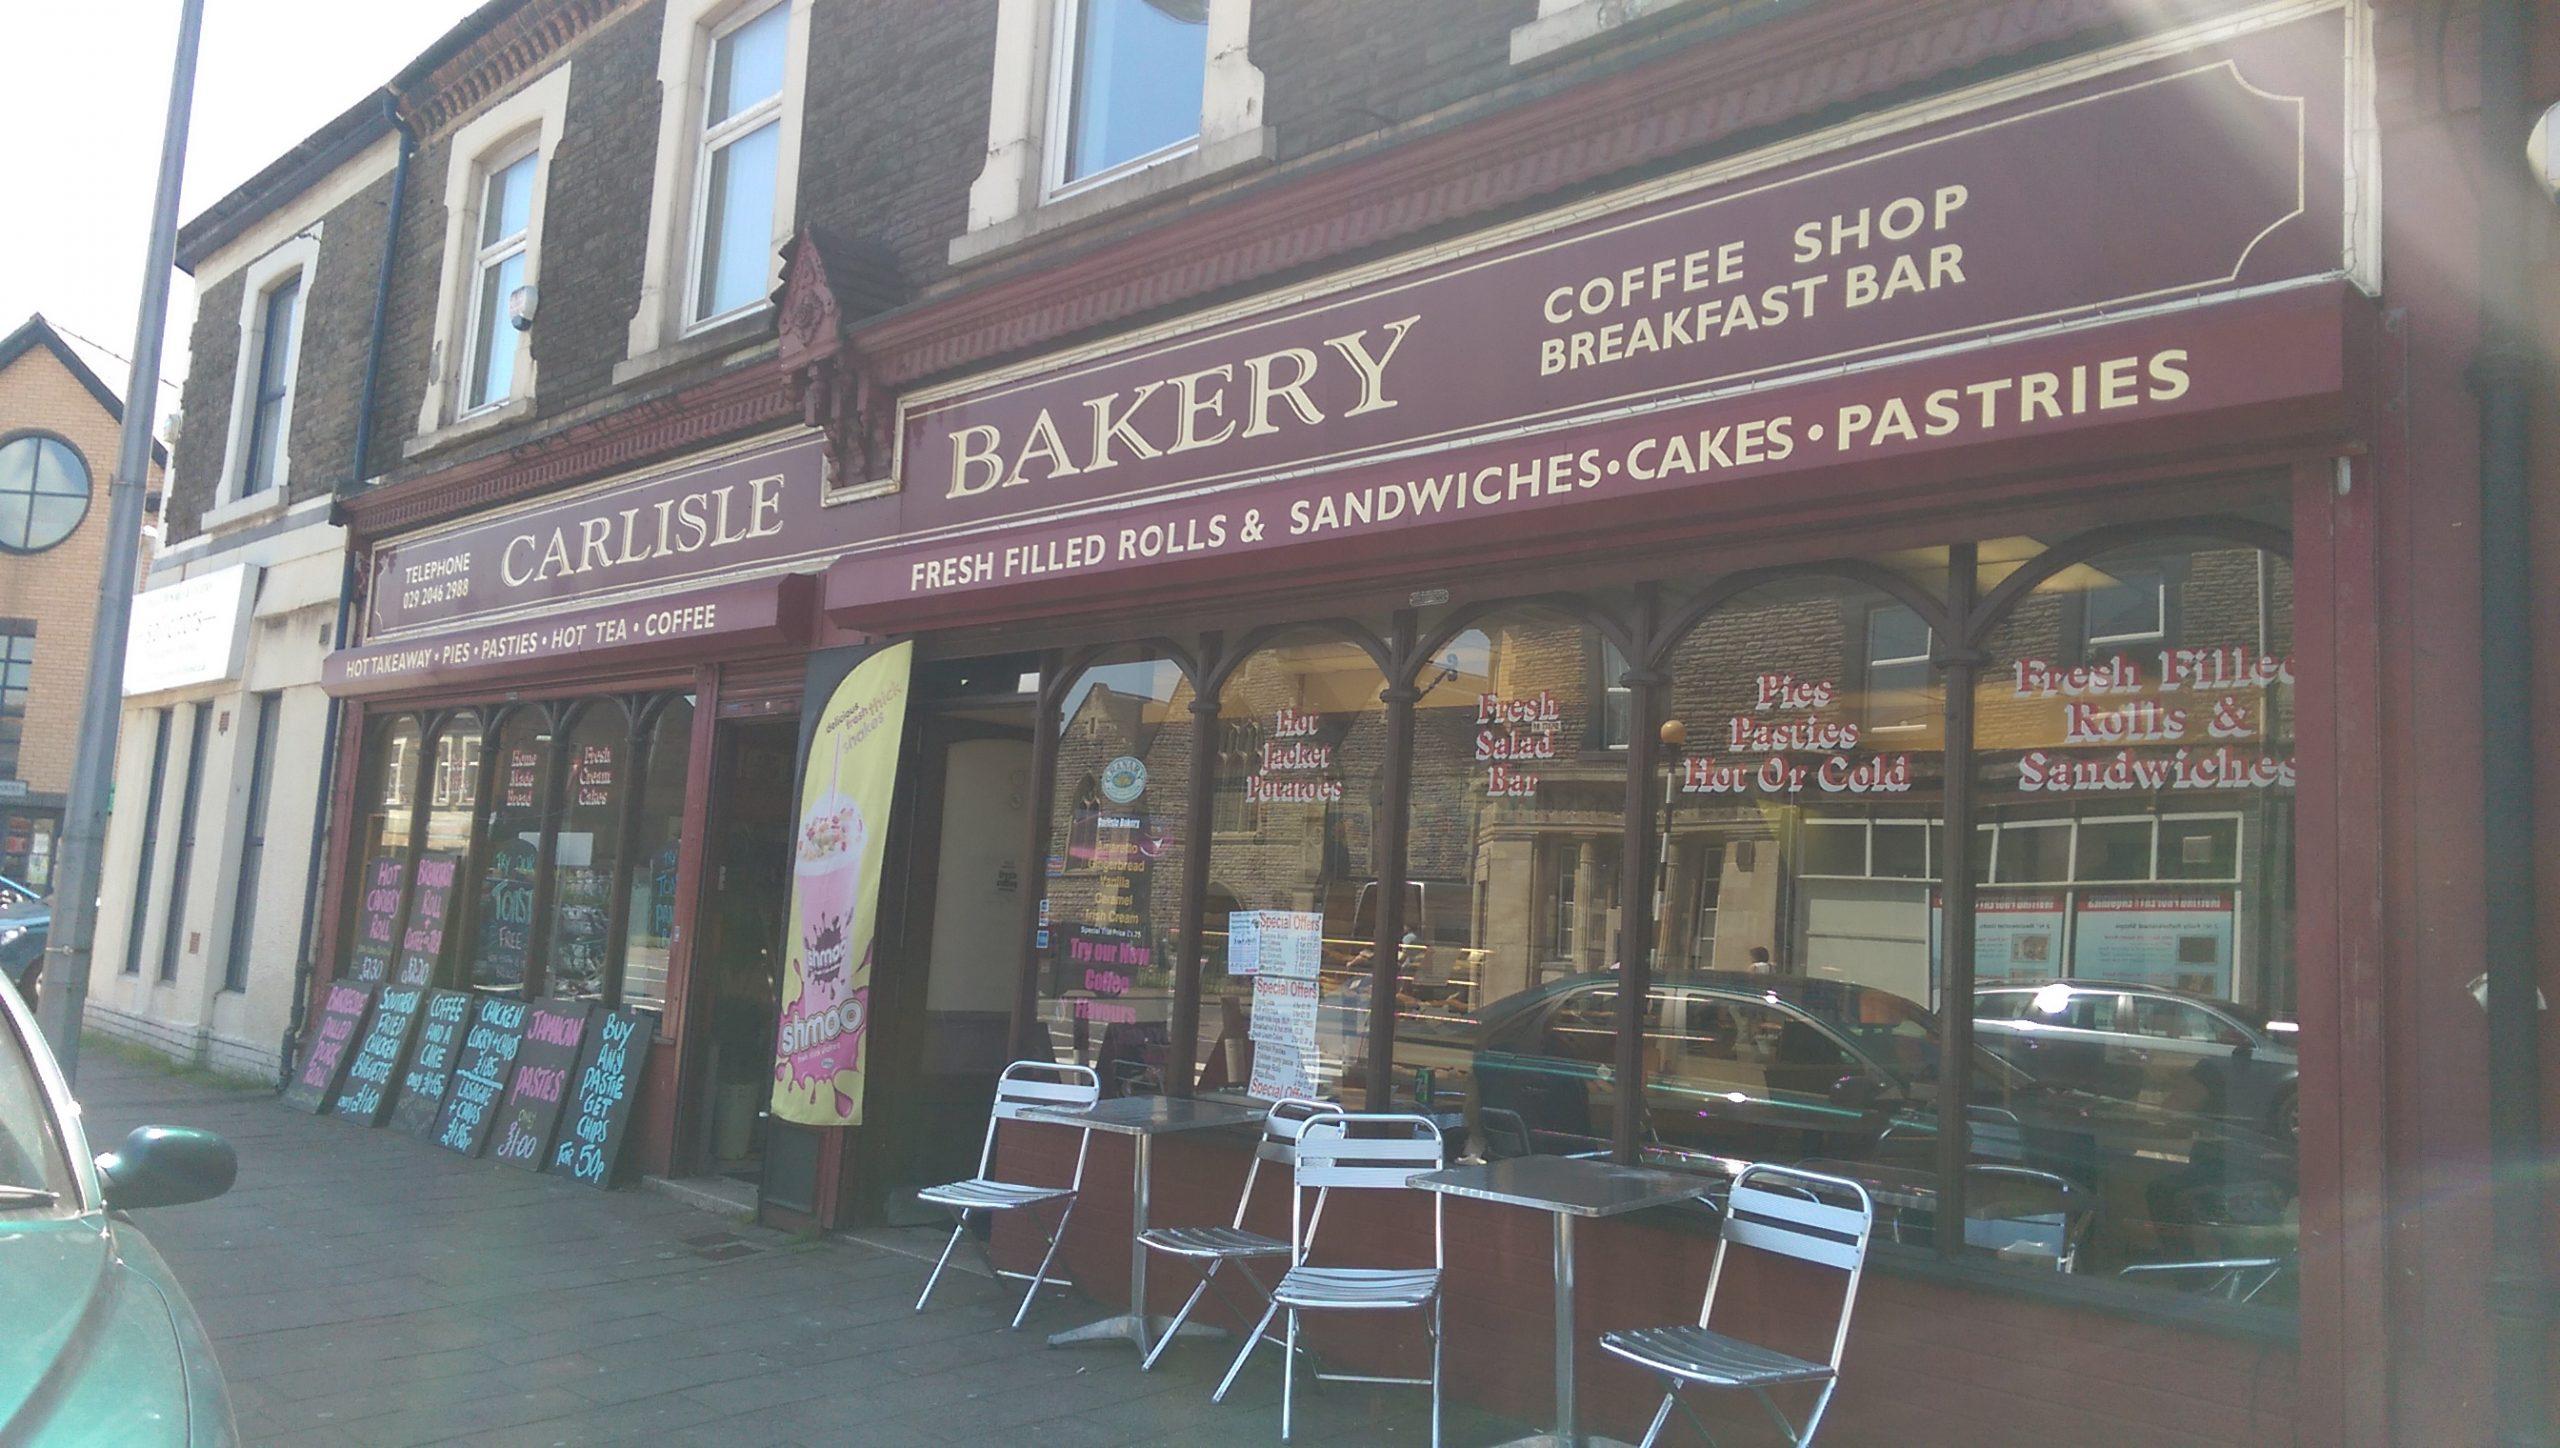 Carlisle Bakery